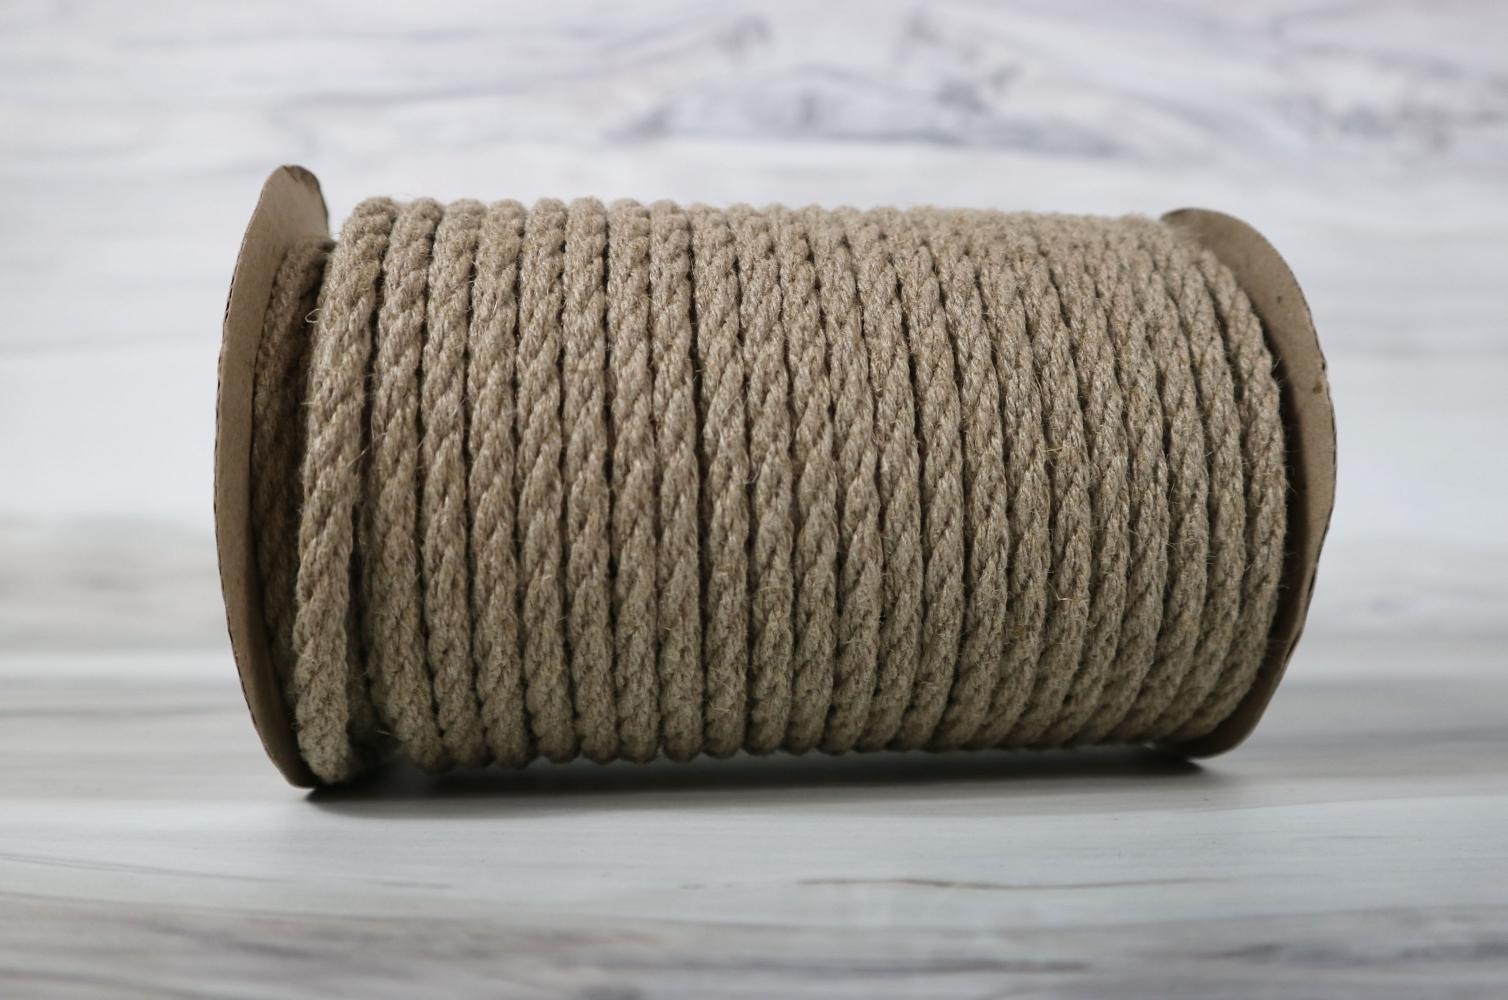 Linen rope diameter 6mm length 25 meters - 1